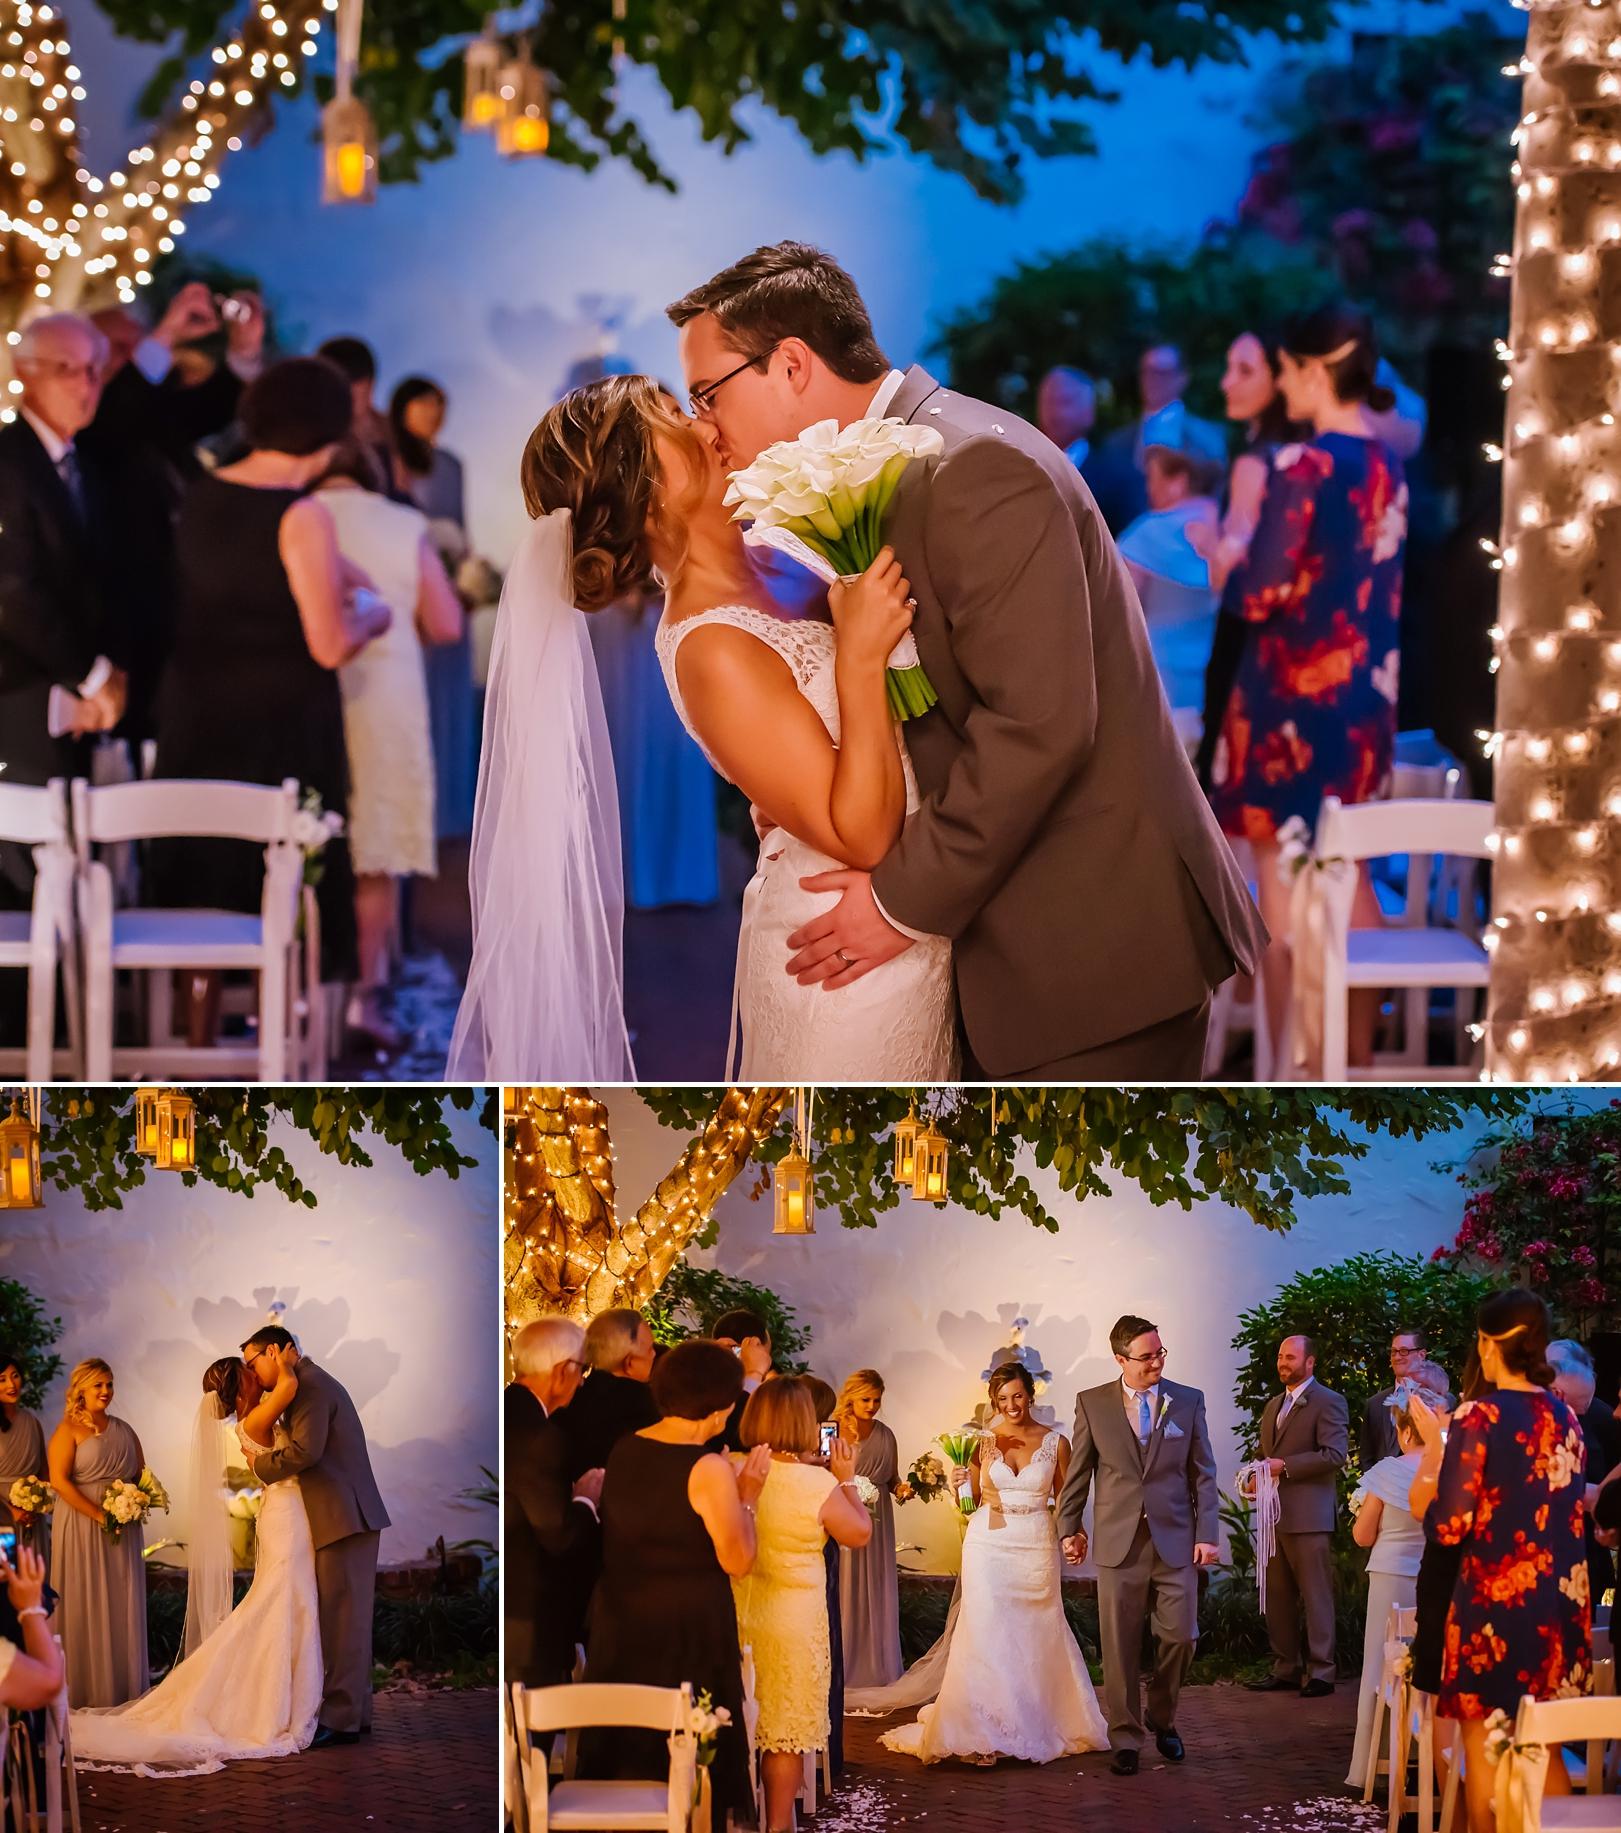 st-pete-art-museum-wedding-vinoy-ashlee-hamon-photography_0015.jpg